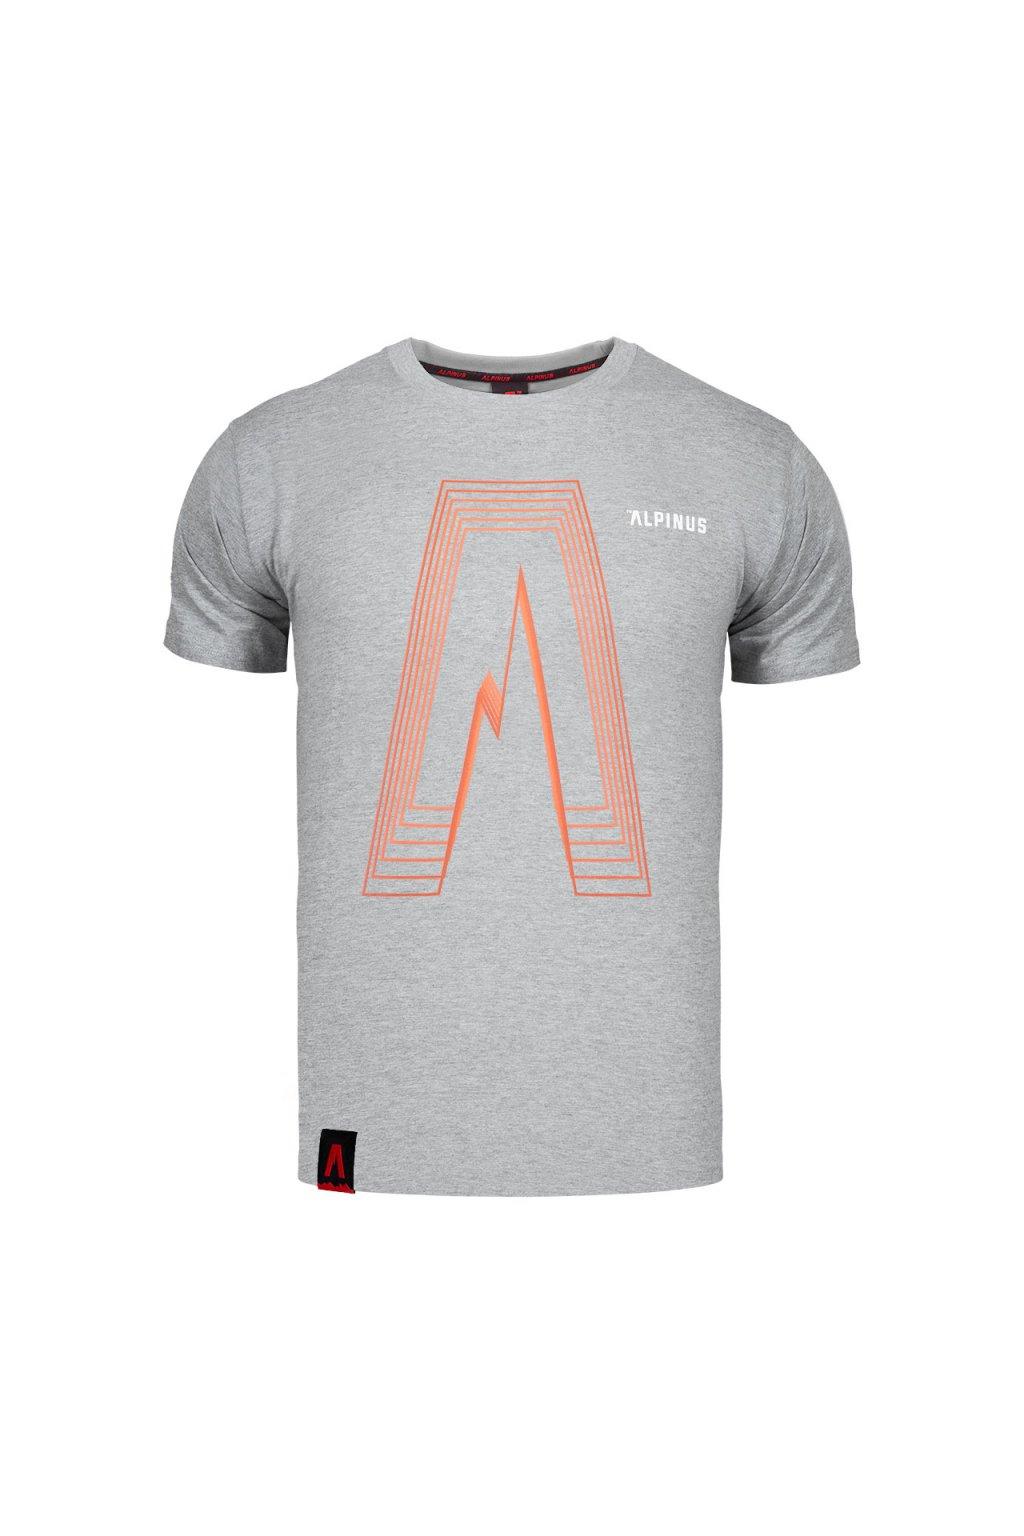 Pánske tričko Alpinus Altai sivé ALP20TC0035